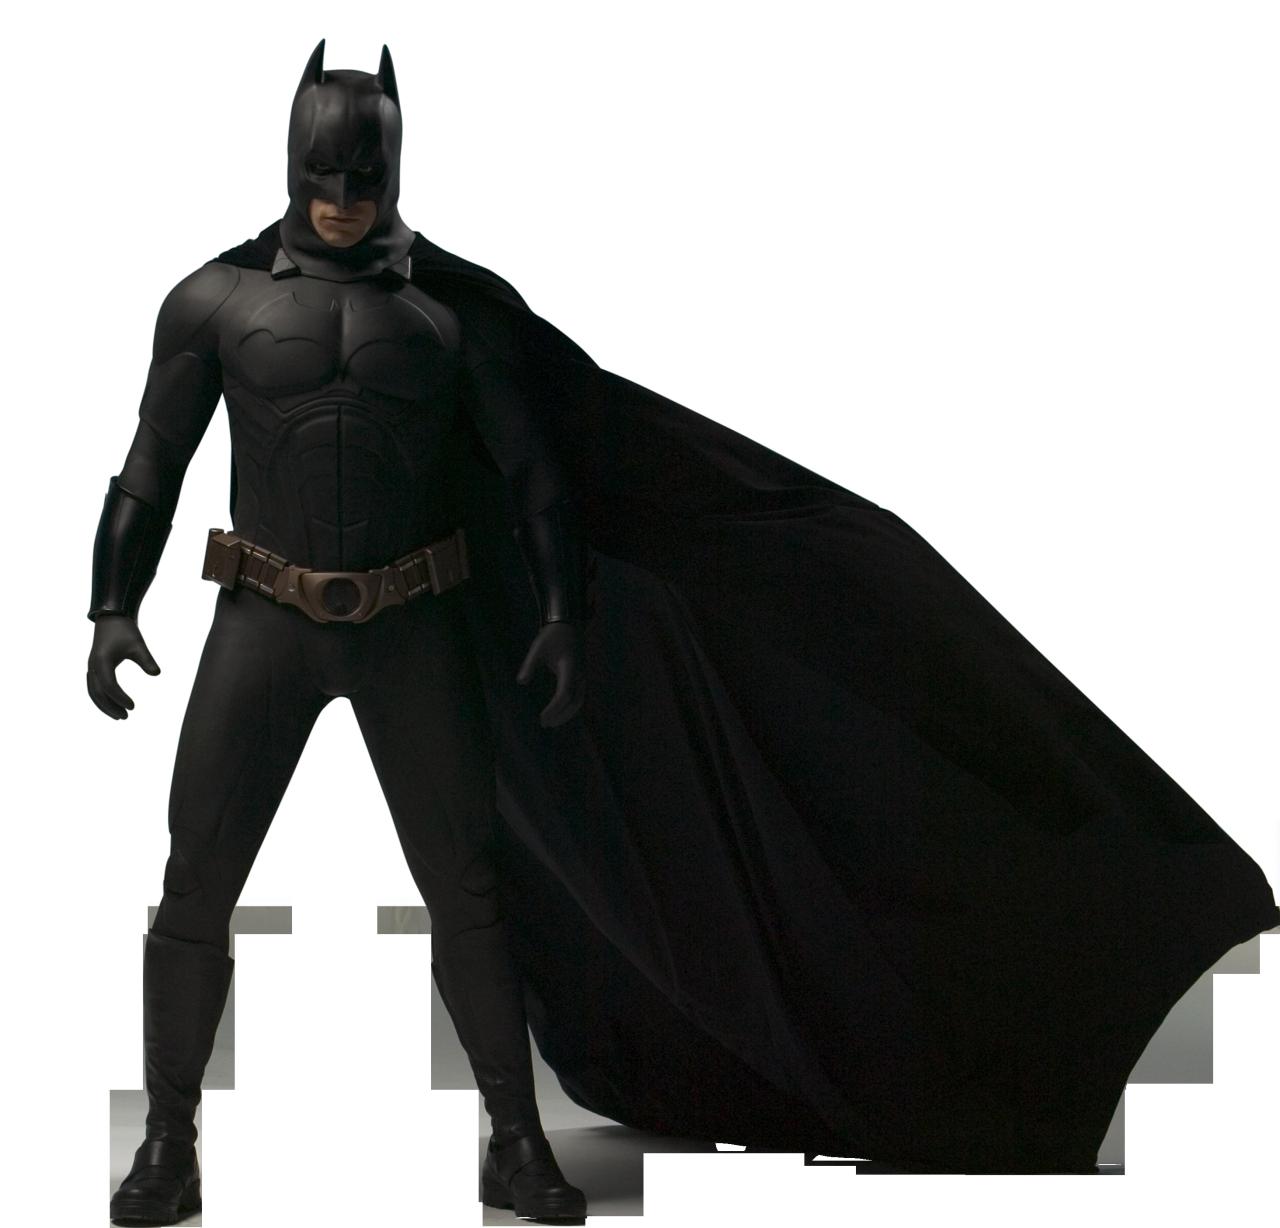 jpg free Transparent batman. Fandom transparents from begins.